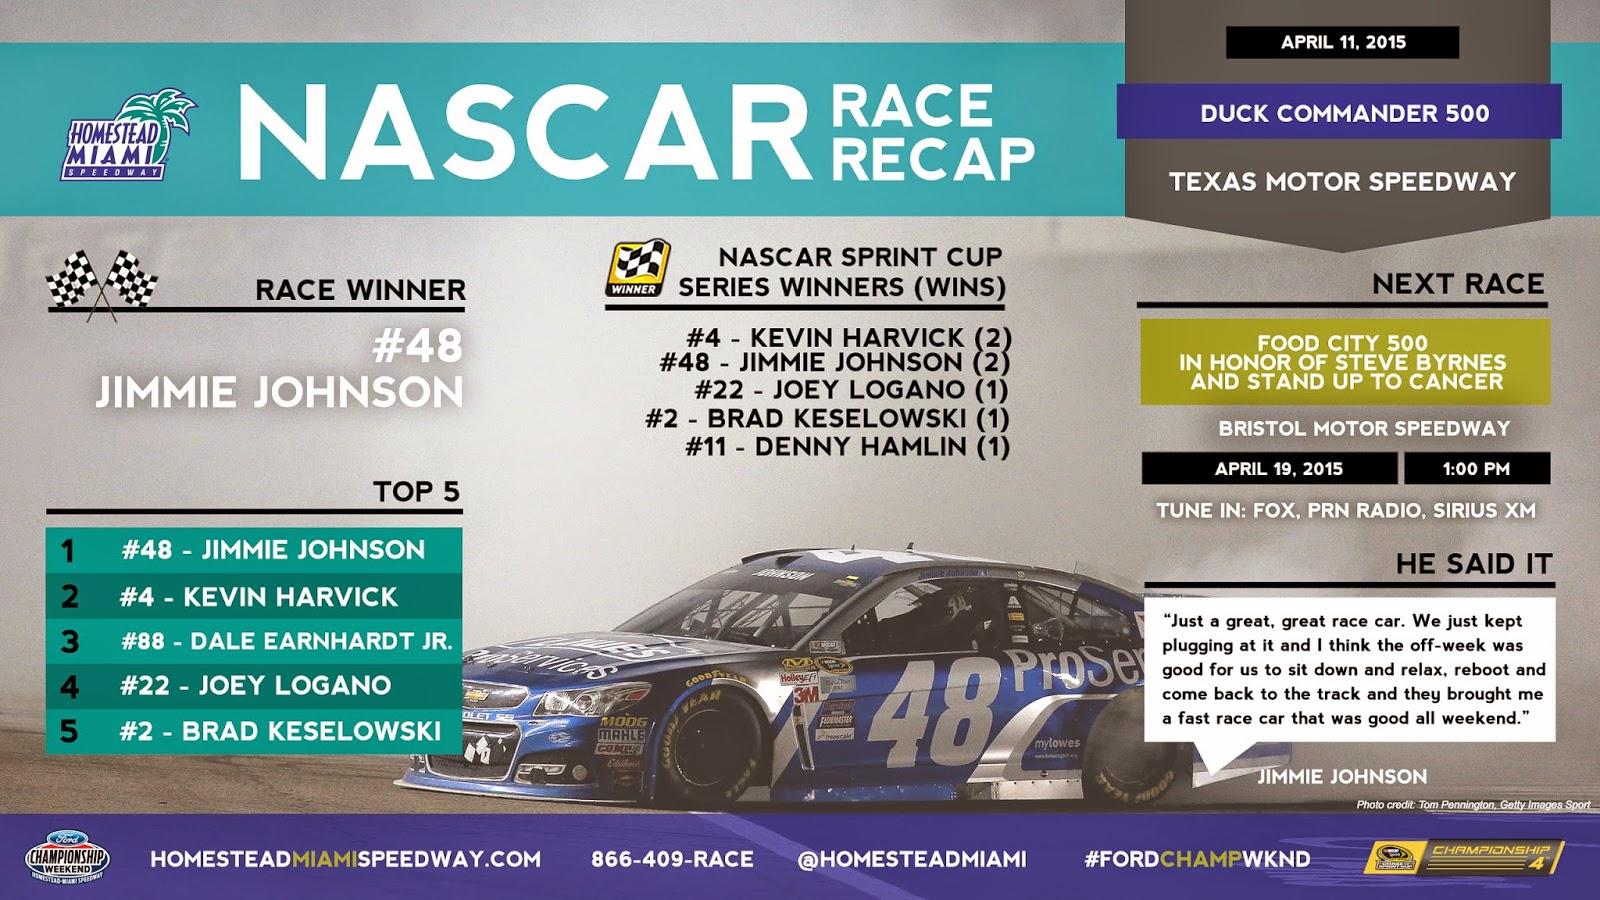 Last lap race recap texas motor speedway for Nascar race tickets texas motor speedway